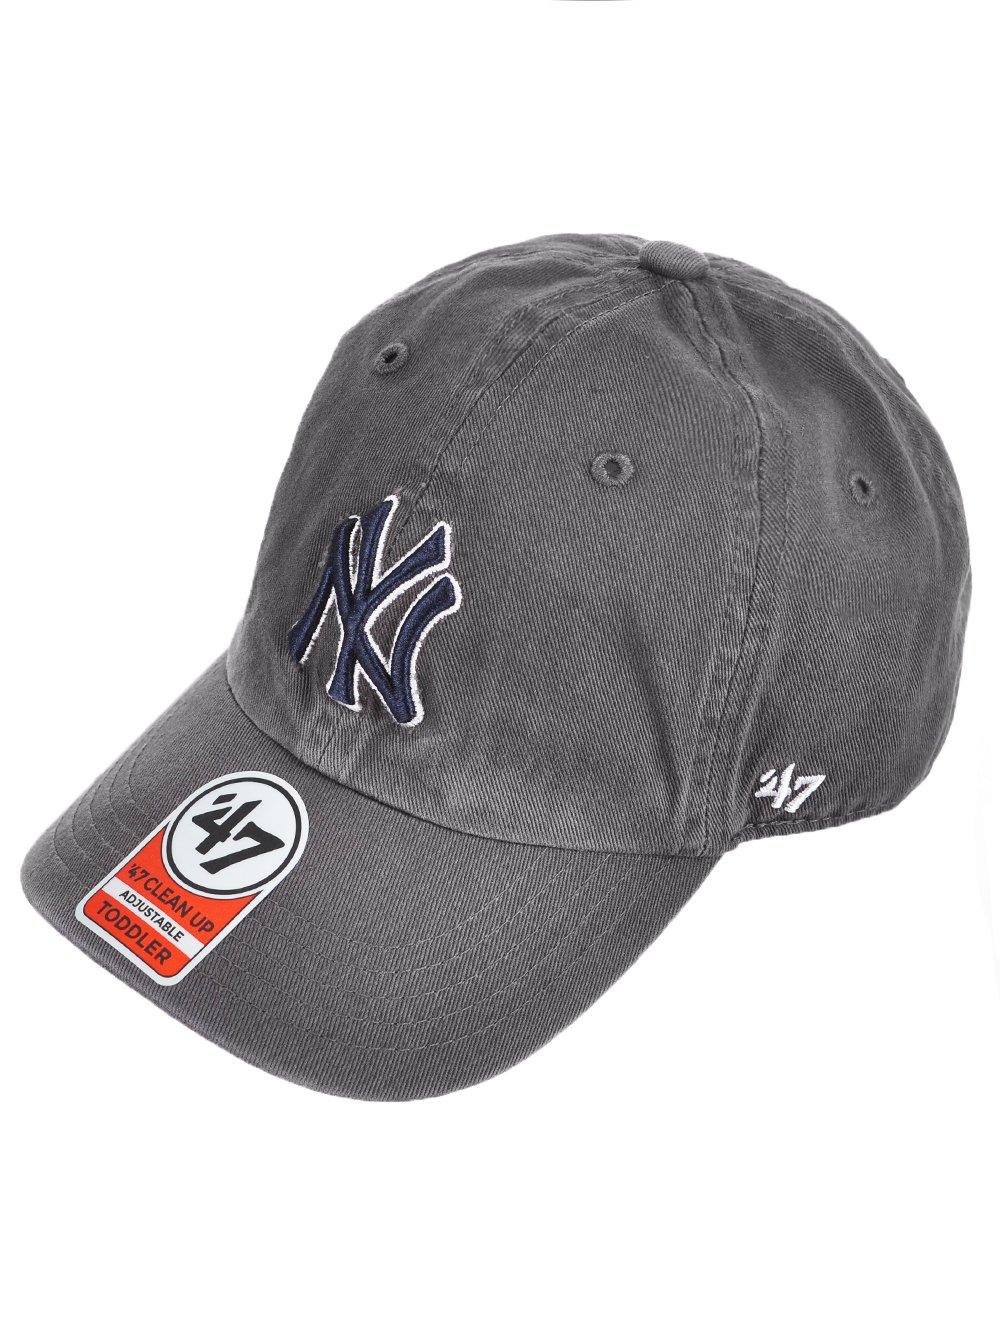 '47 York Yankees Baseball Cap - Gray, one Size